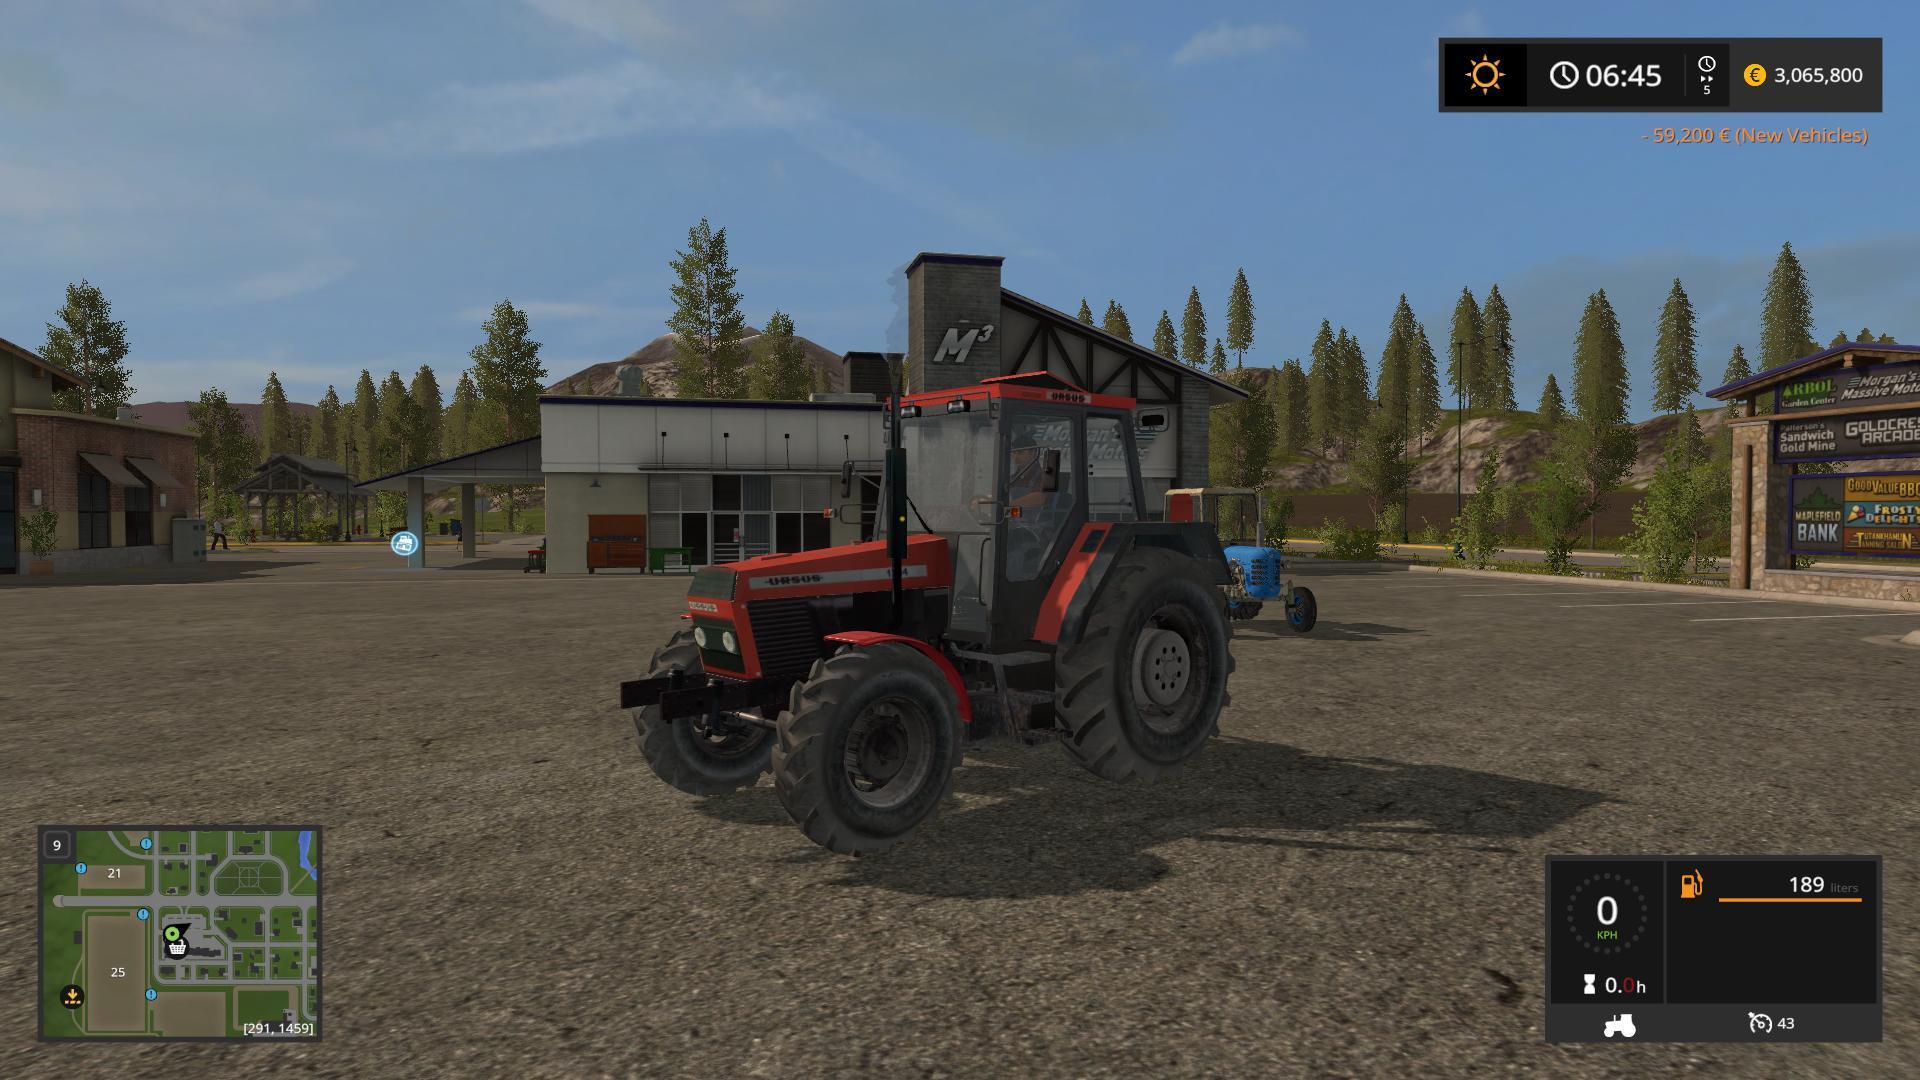 URSUS 1234 Farming simulator 17 v1 - Modhub us